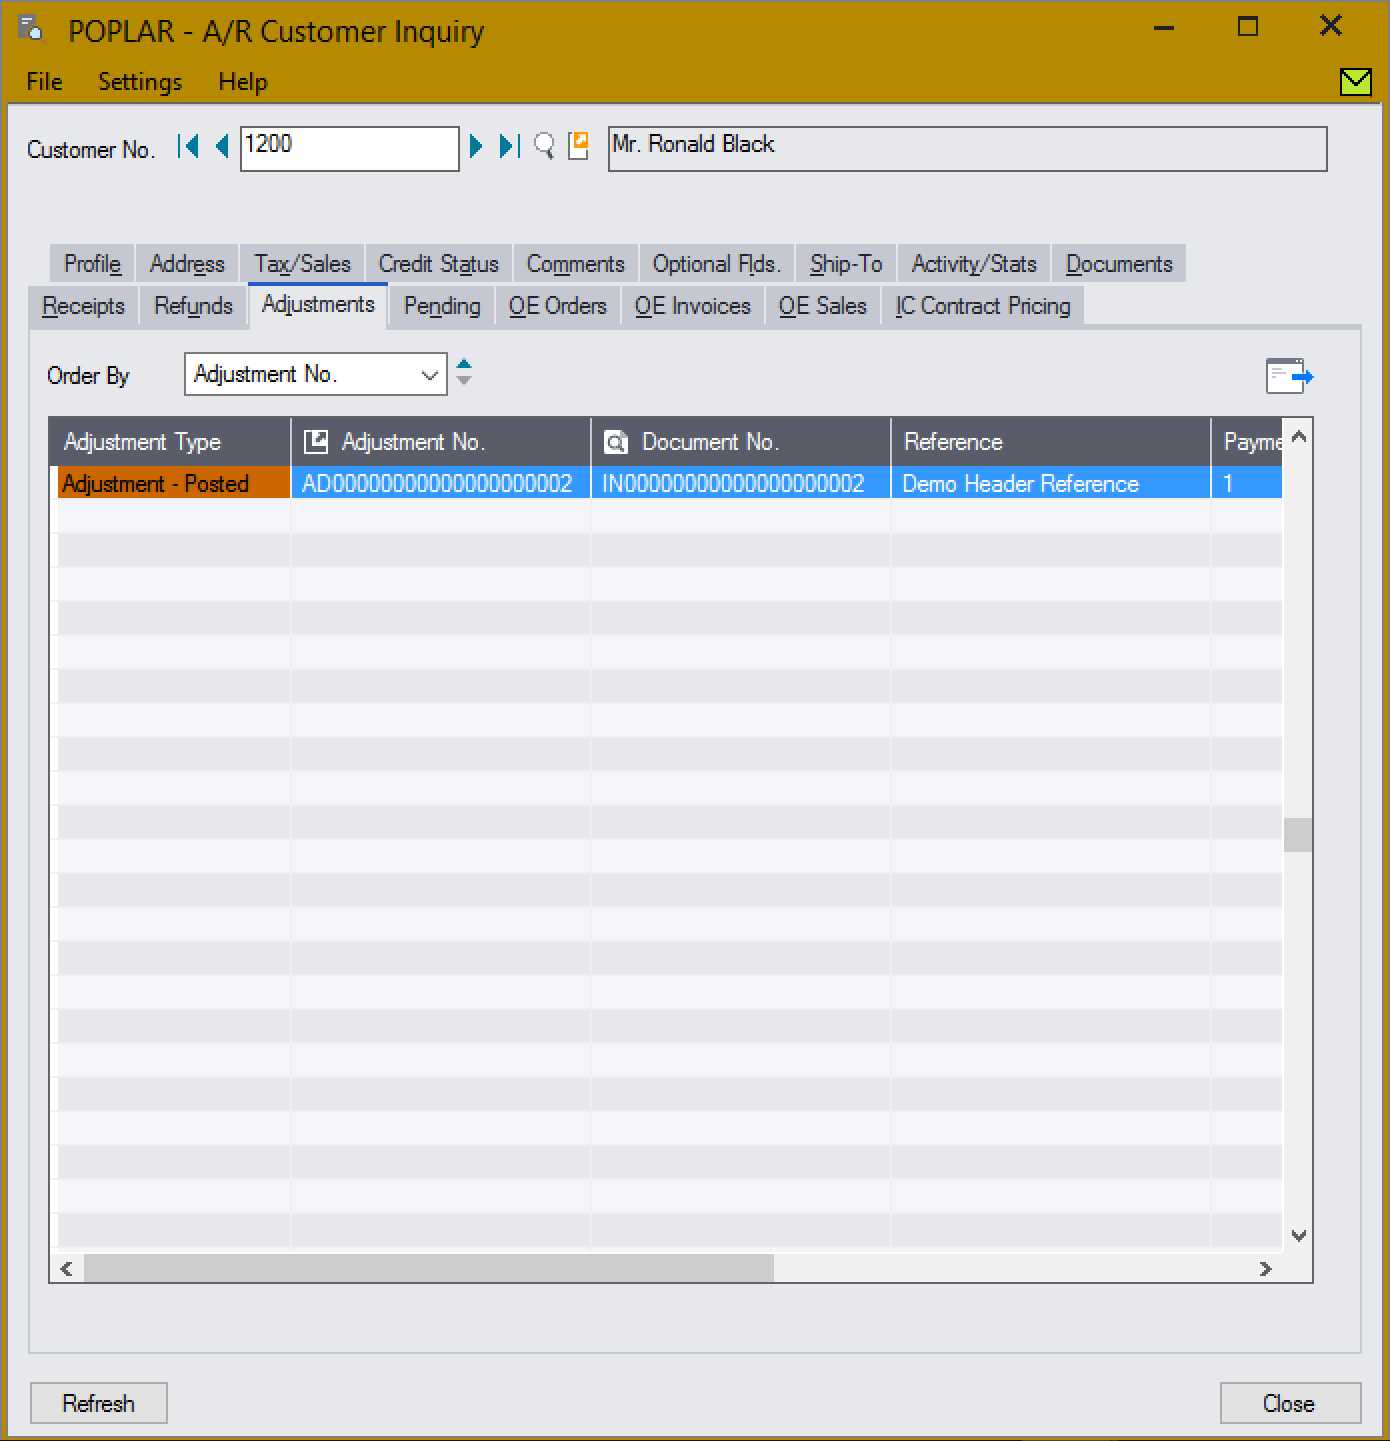 Screenshot of Customer Inquiry screen